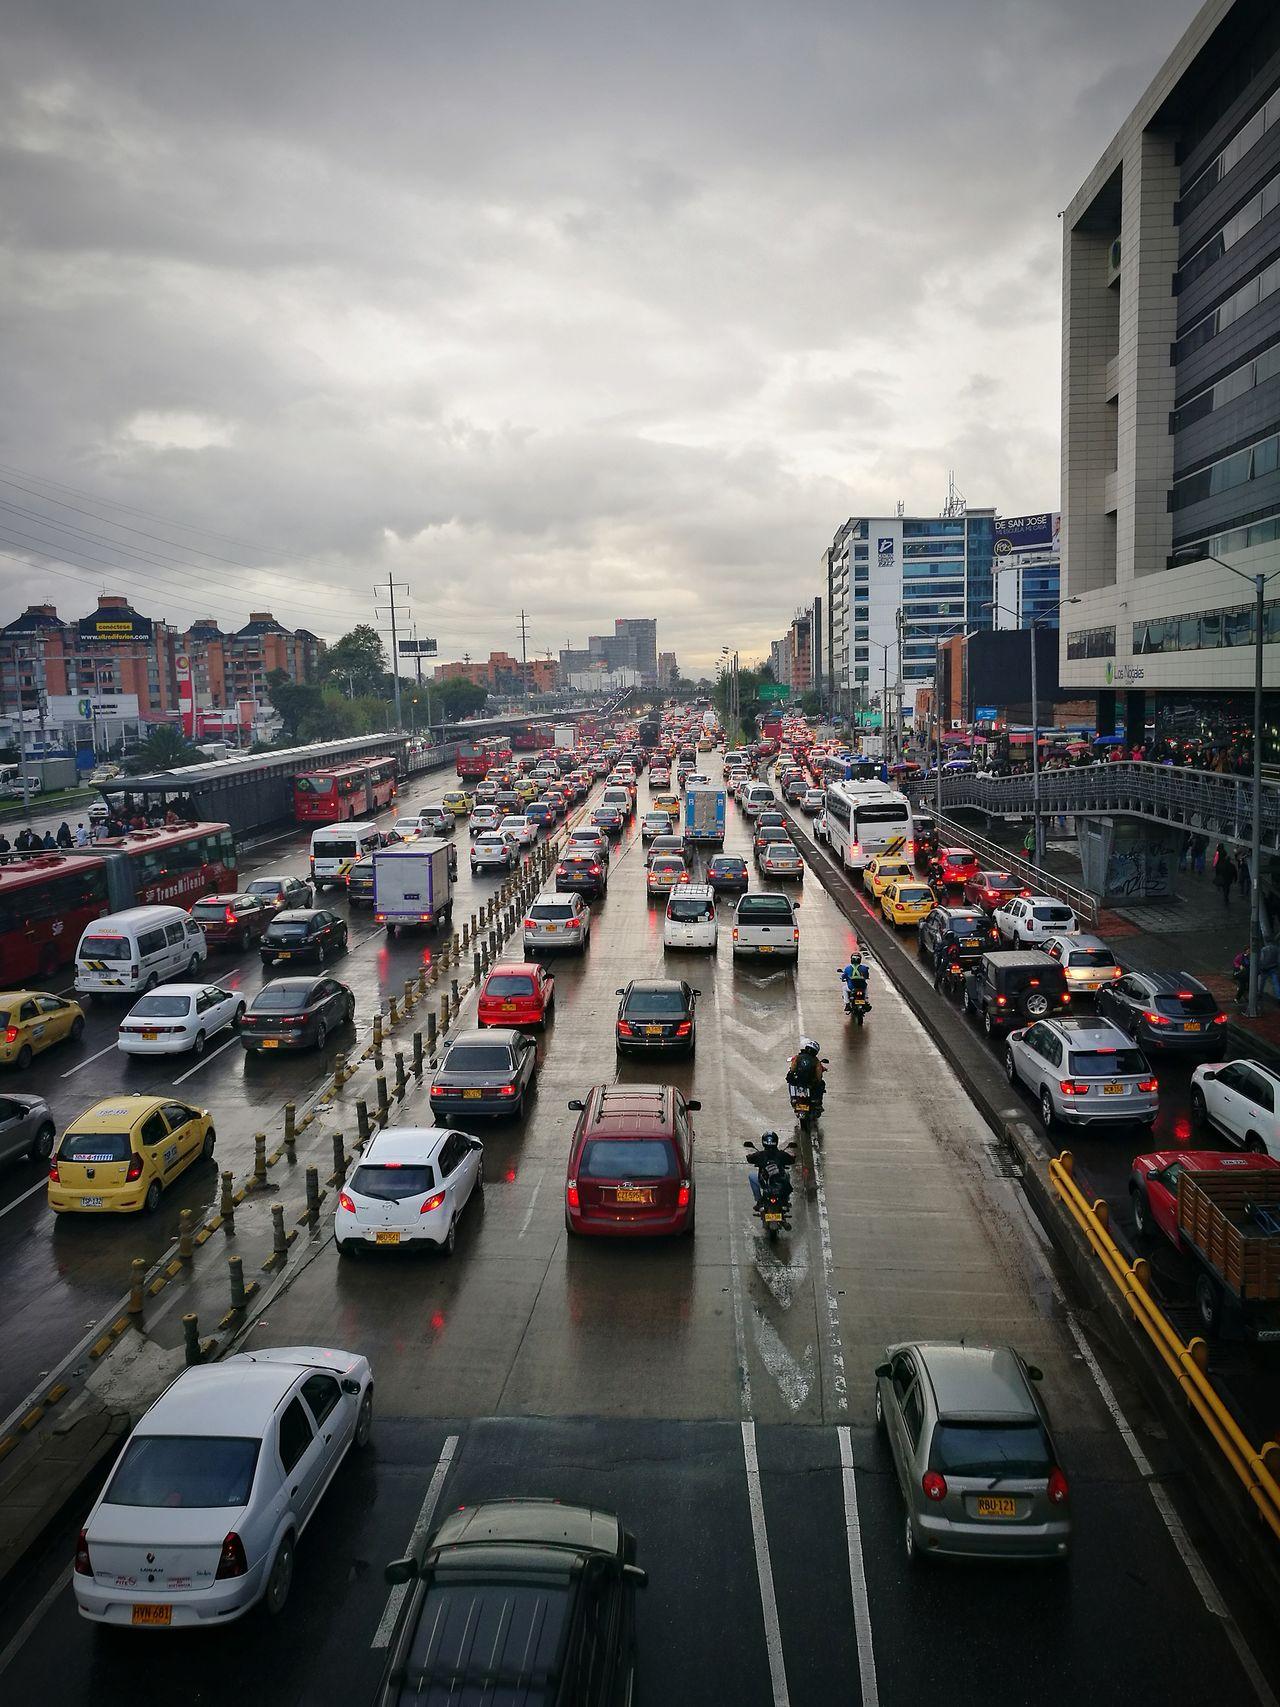 Bogotá Traffic Traffic Jam The Photojournalist - 2017 EyeEm Awards The Street Photographer - 2017 EyeEm Awards